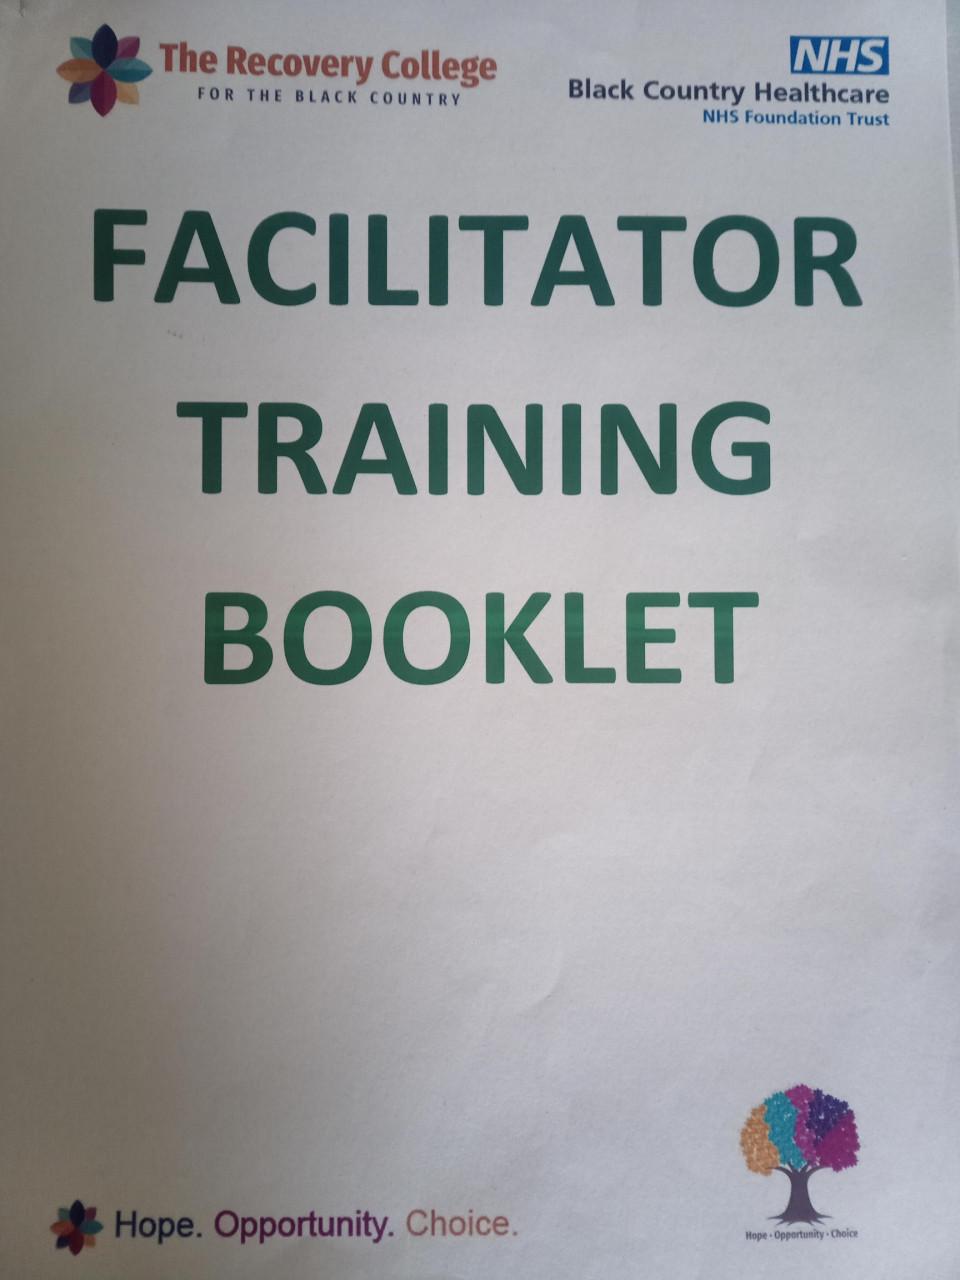 Facilitator-training-booklet-phot_20210817-142627_1